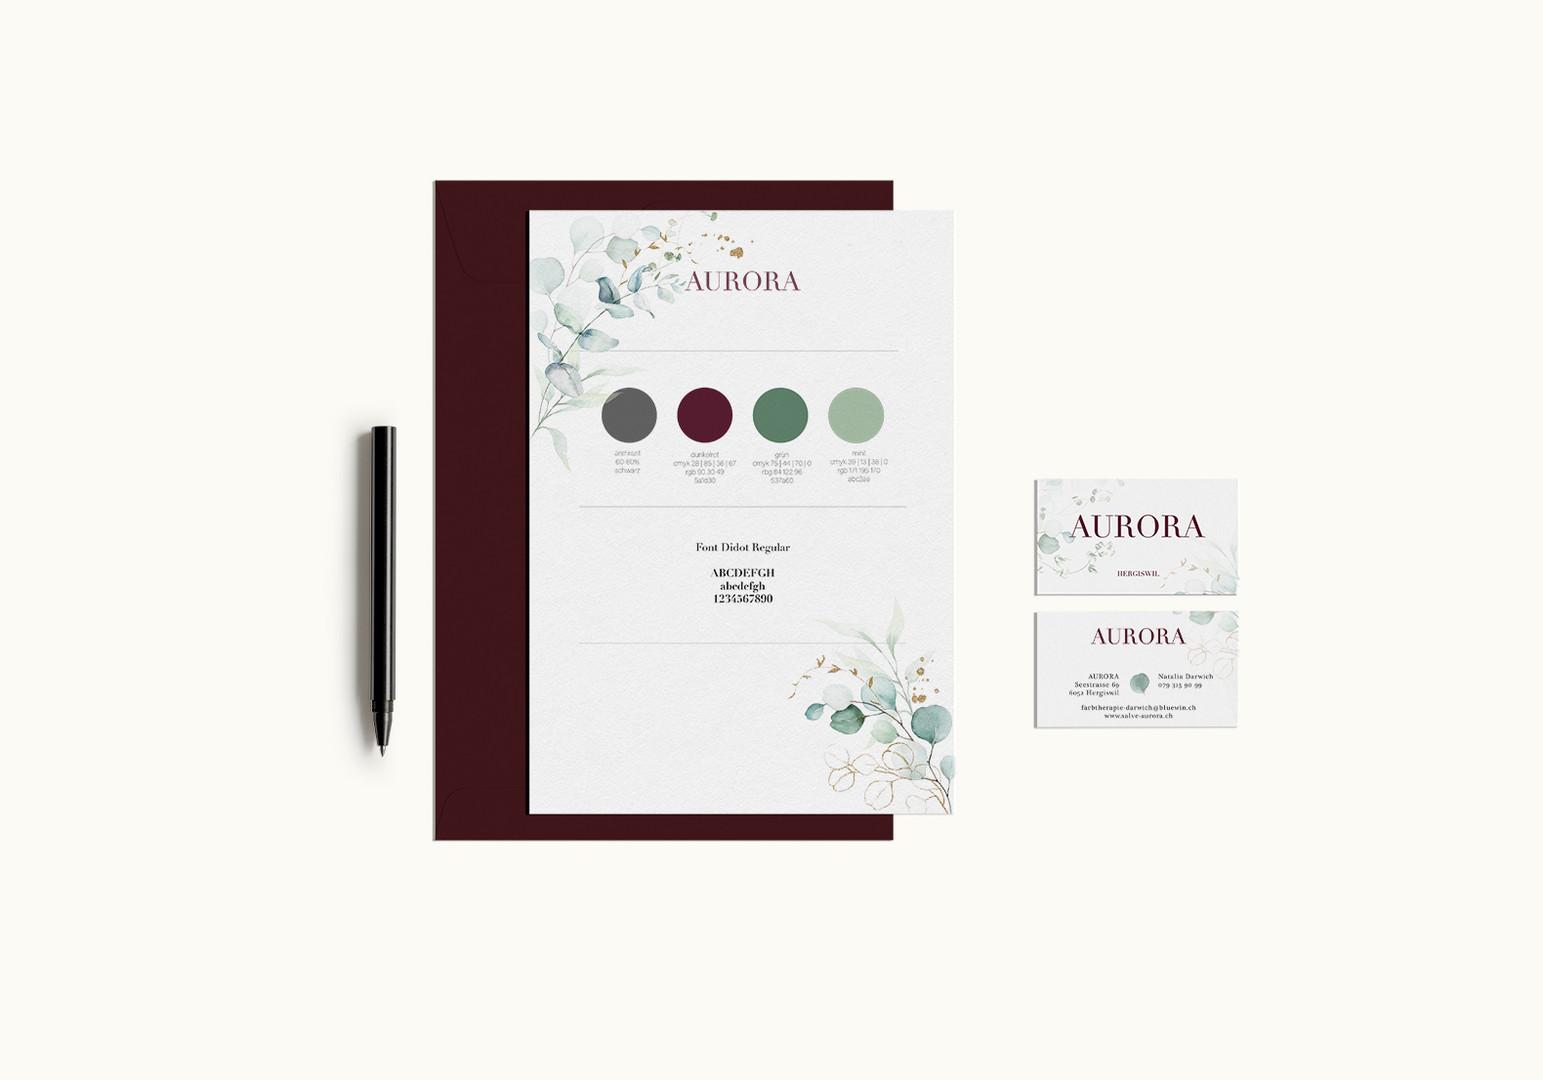 aurora-hergiswil-design.jpg